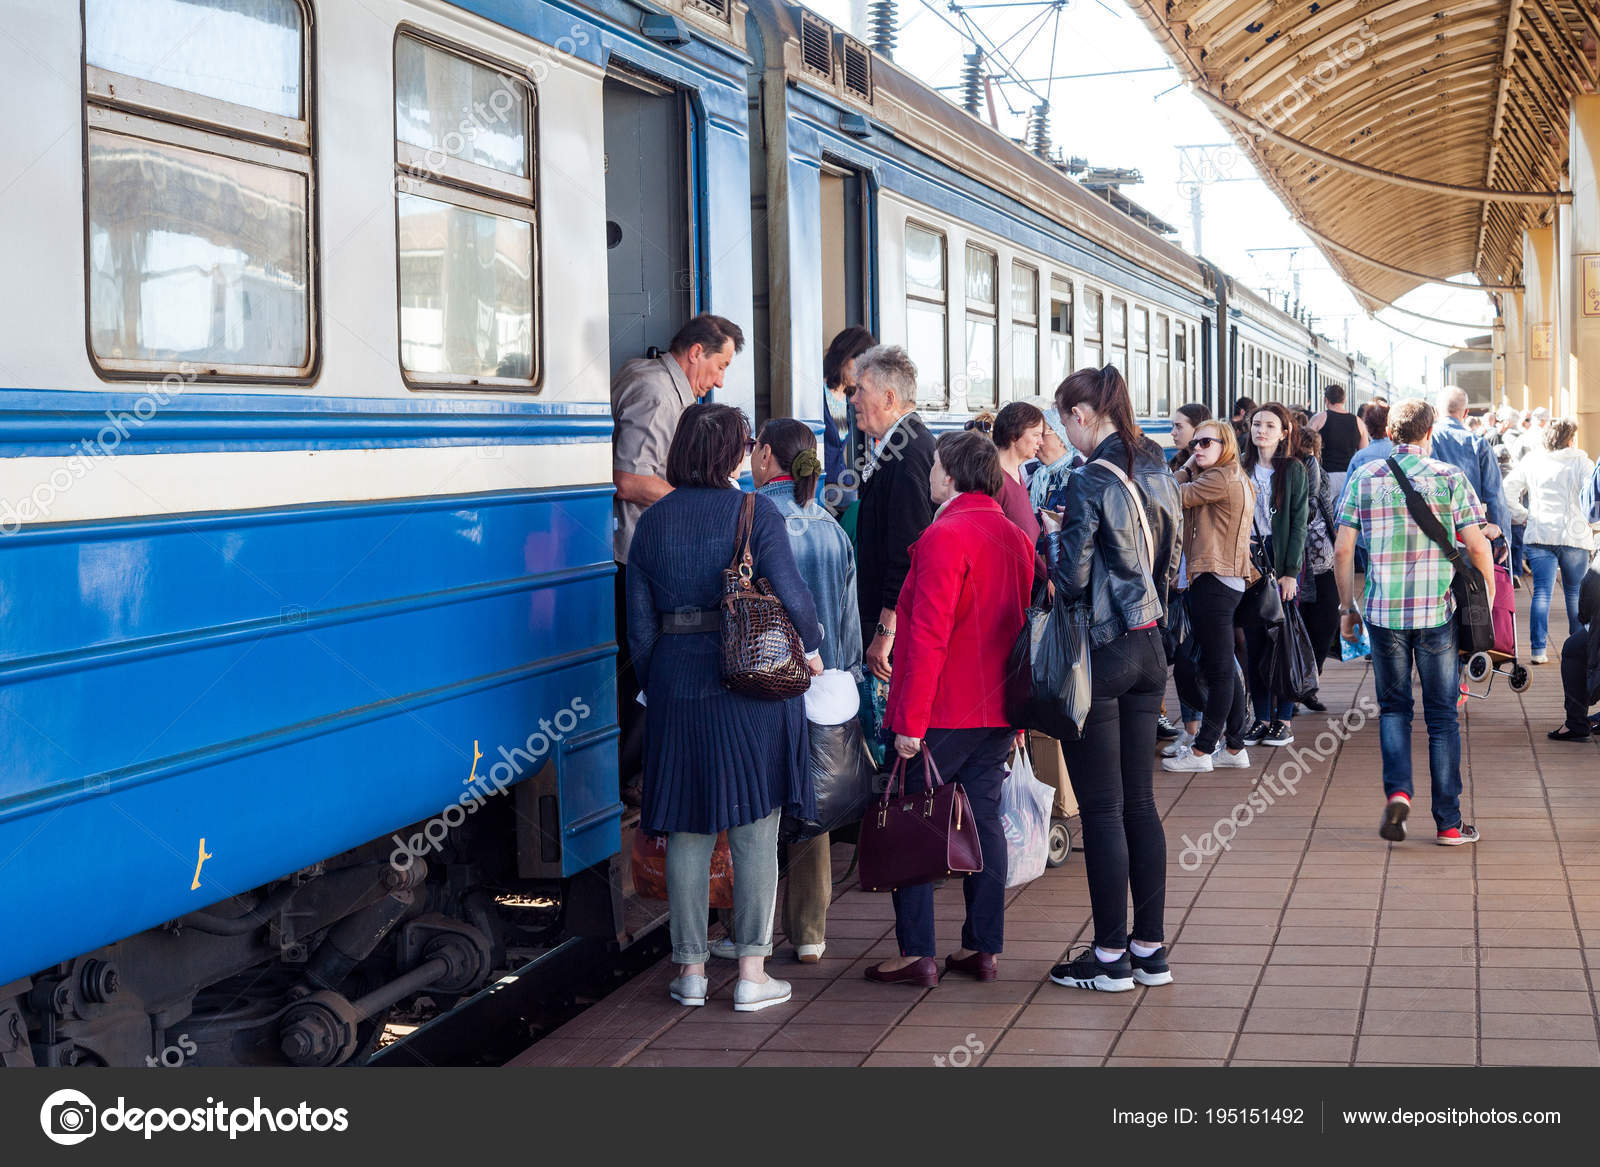 Minsk Belarus May 2018 Railway Station Passengers Enter